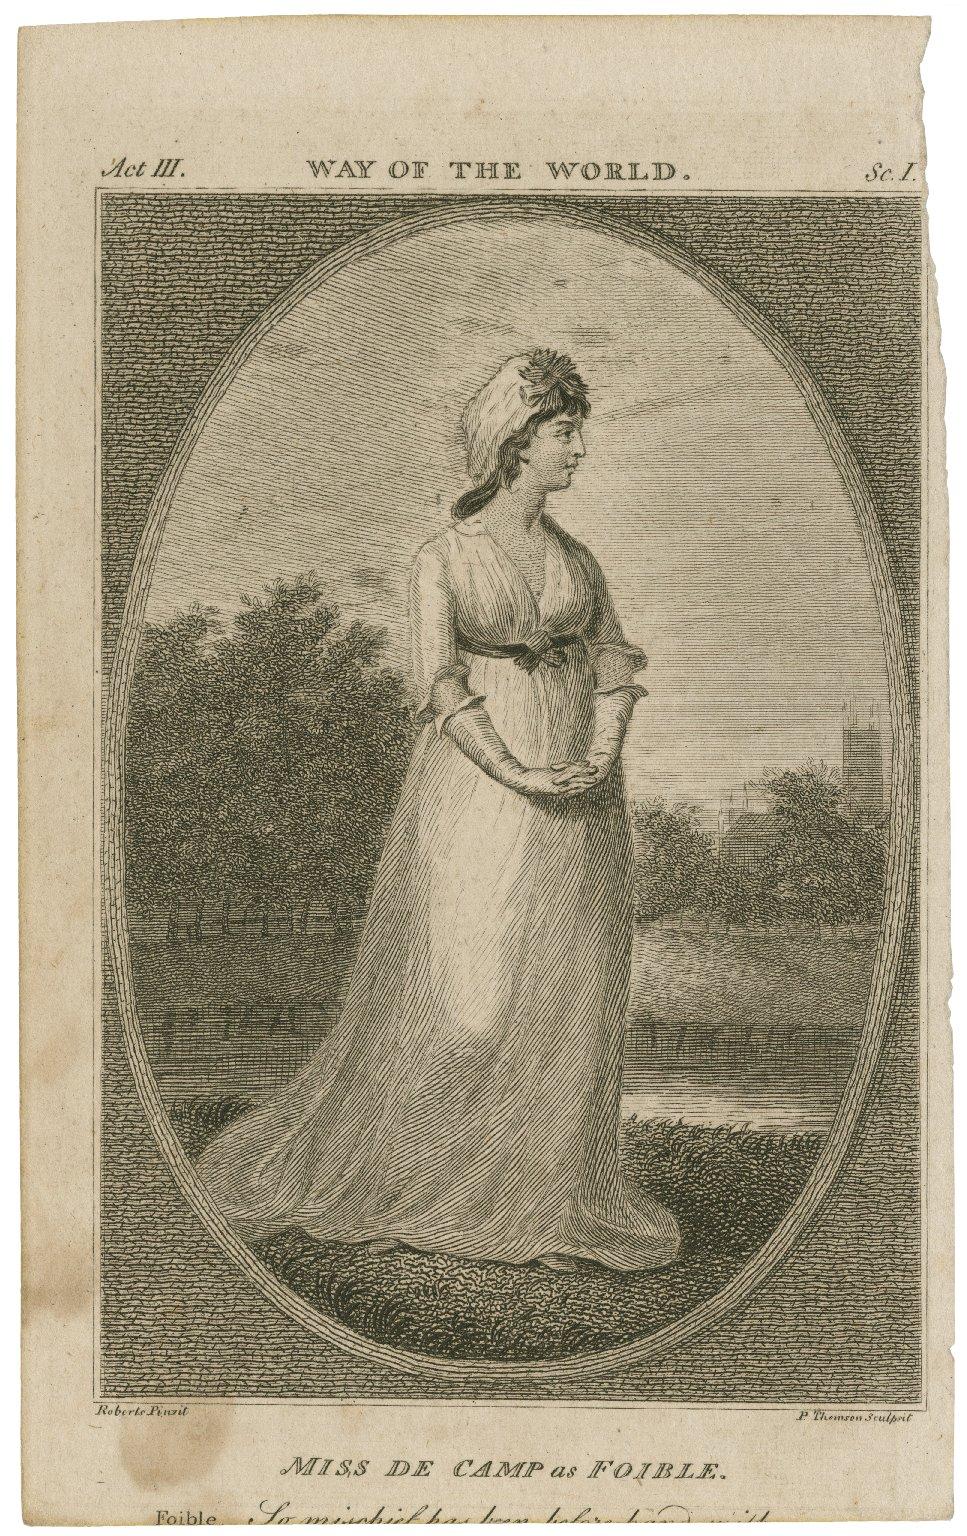 Miss de Camp as Foible [graphic] / Roberts, pinxit ; P. Thomson, sculpsit.